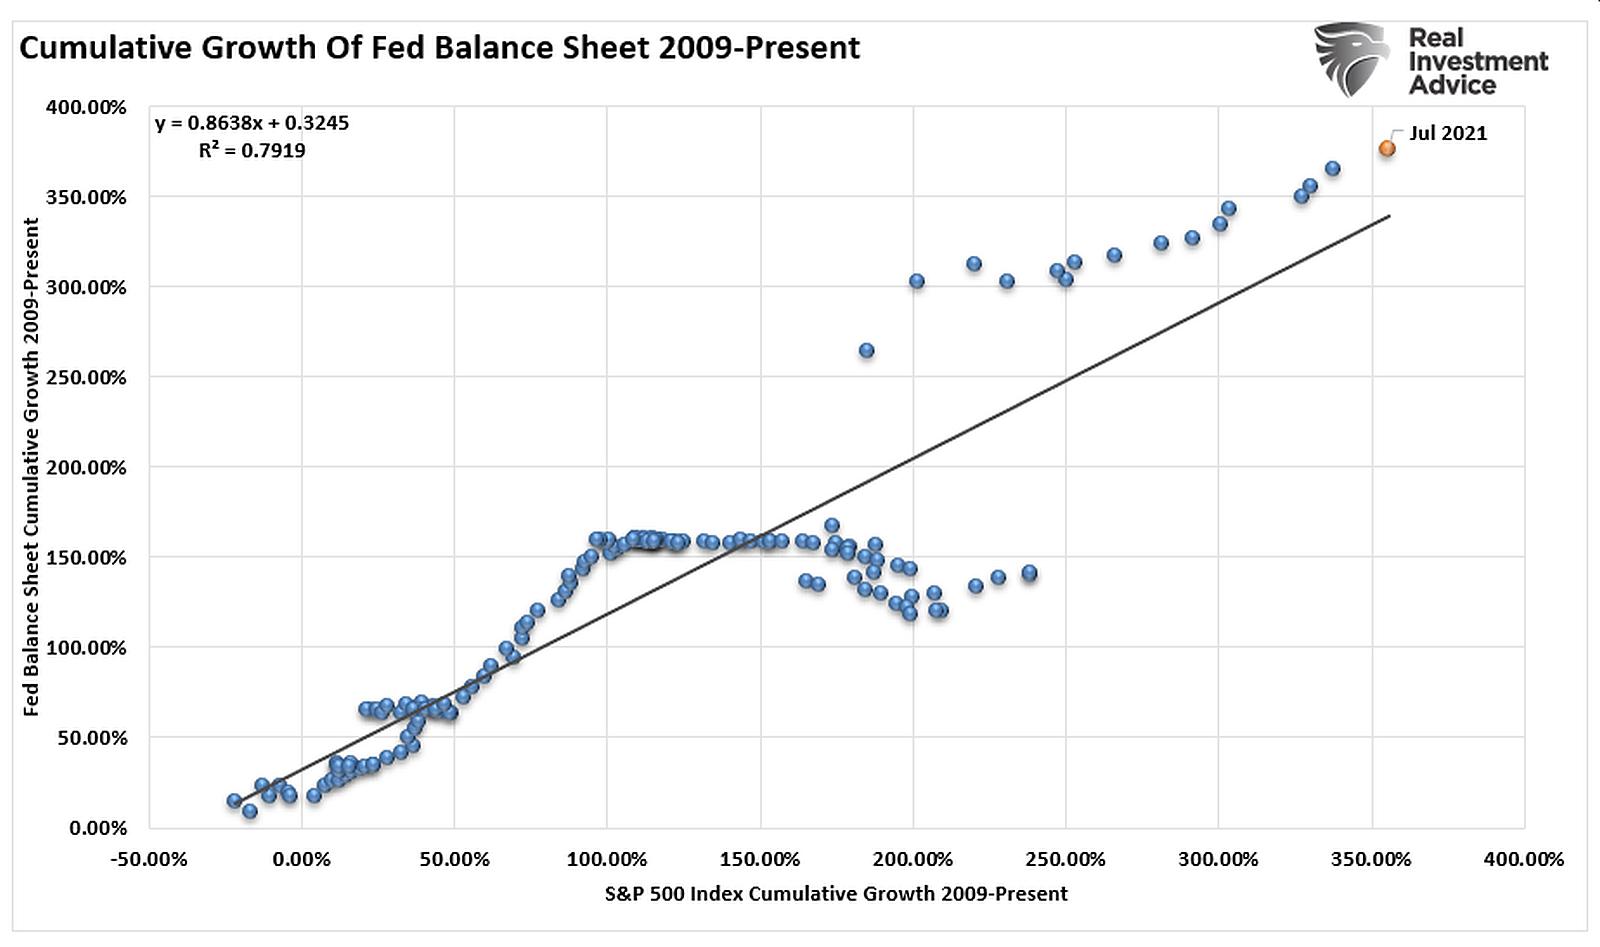 Cumulative-Growth-Of-Fed-Balance-Sheet-2009-Present